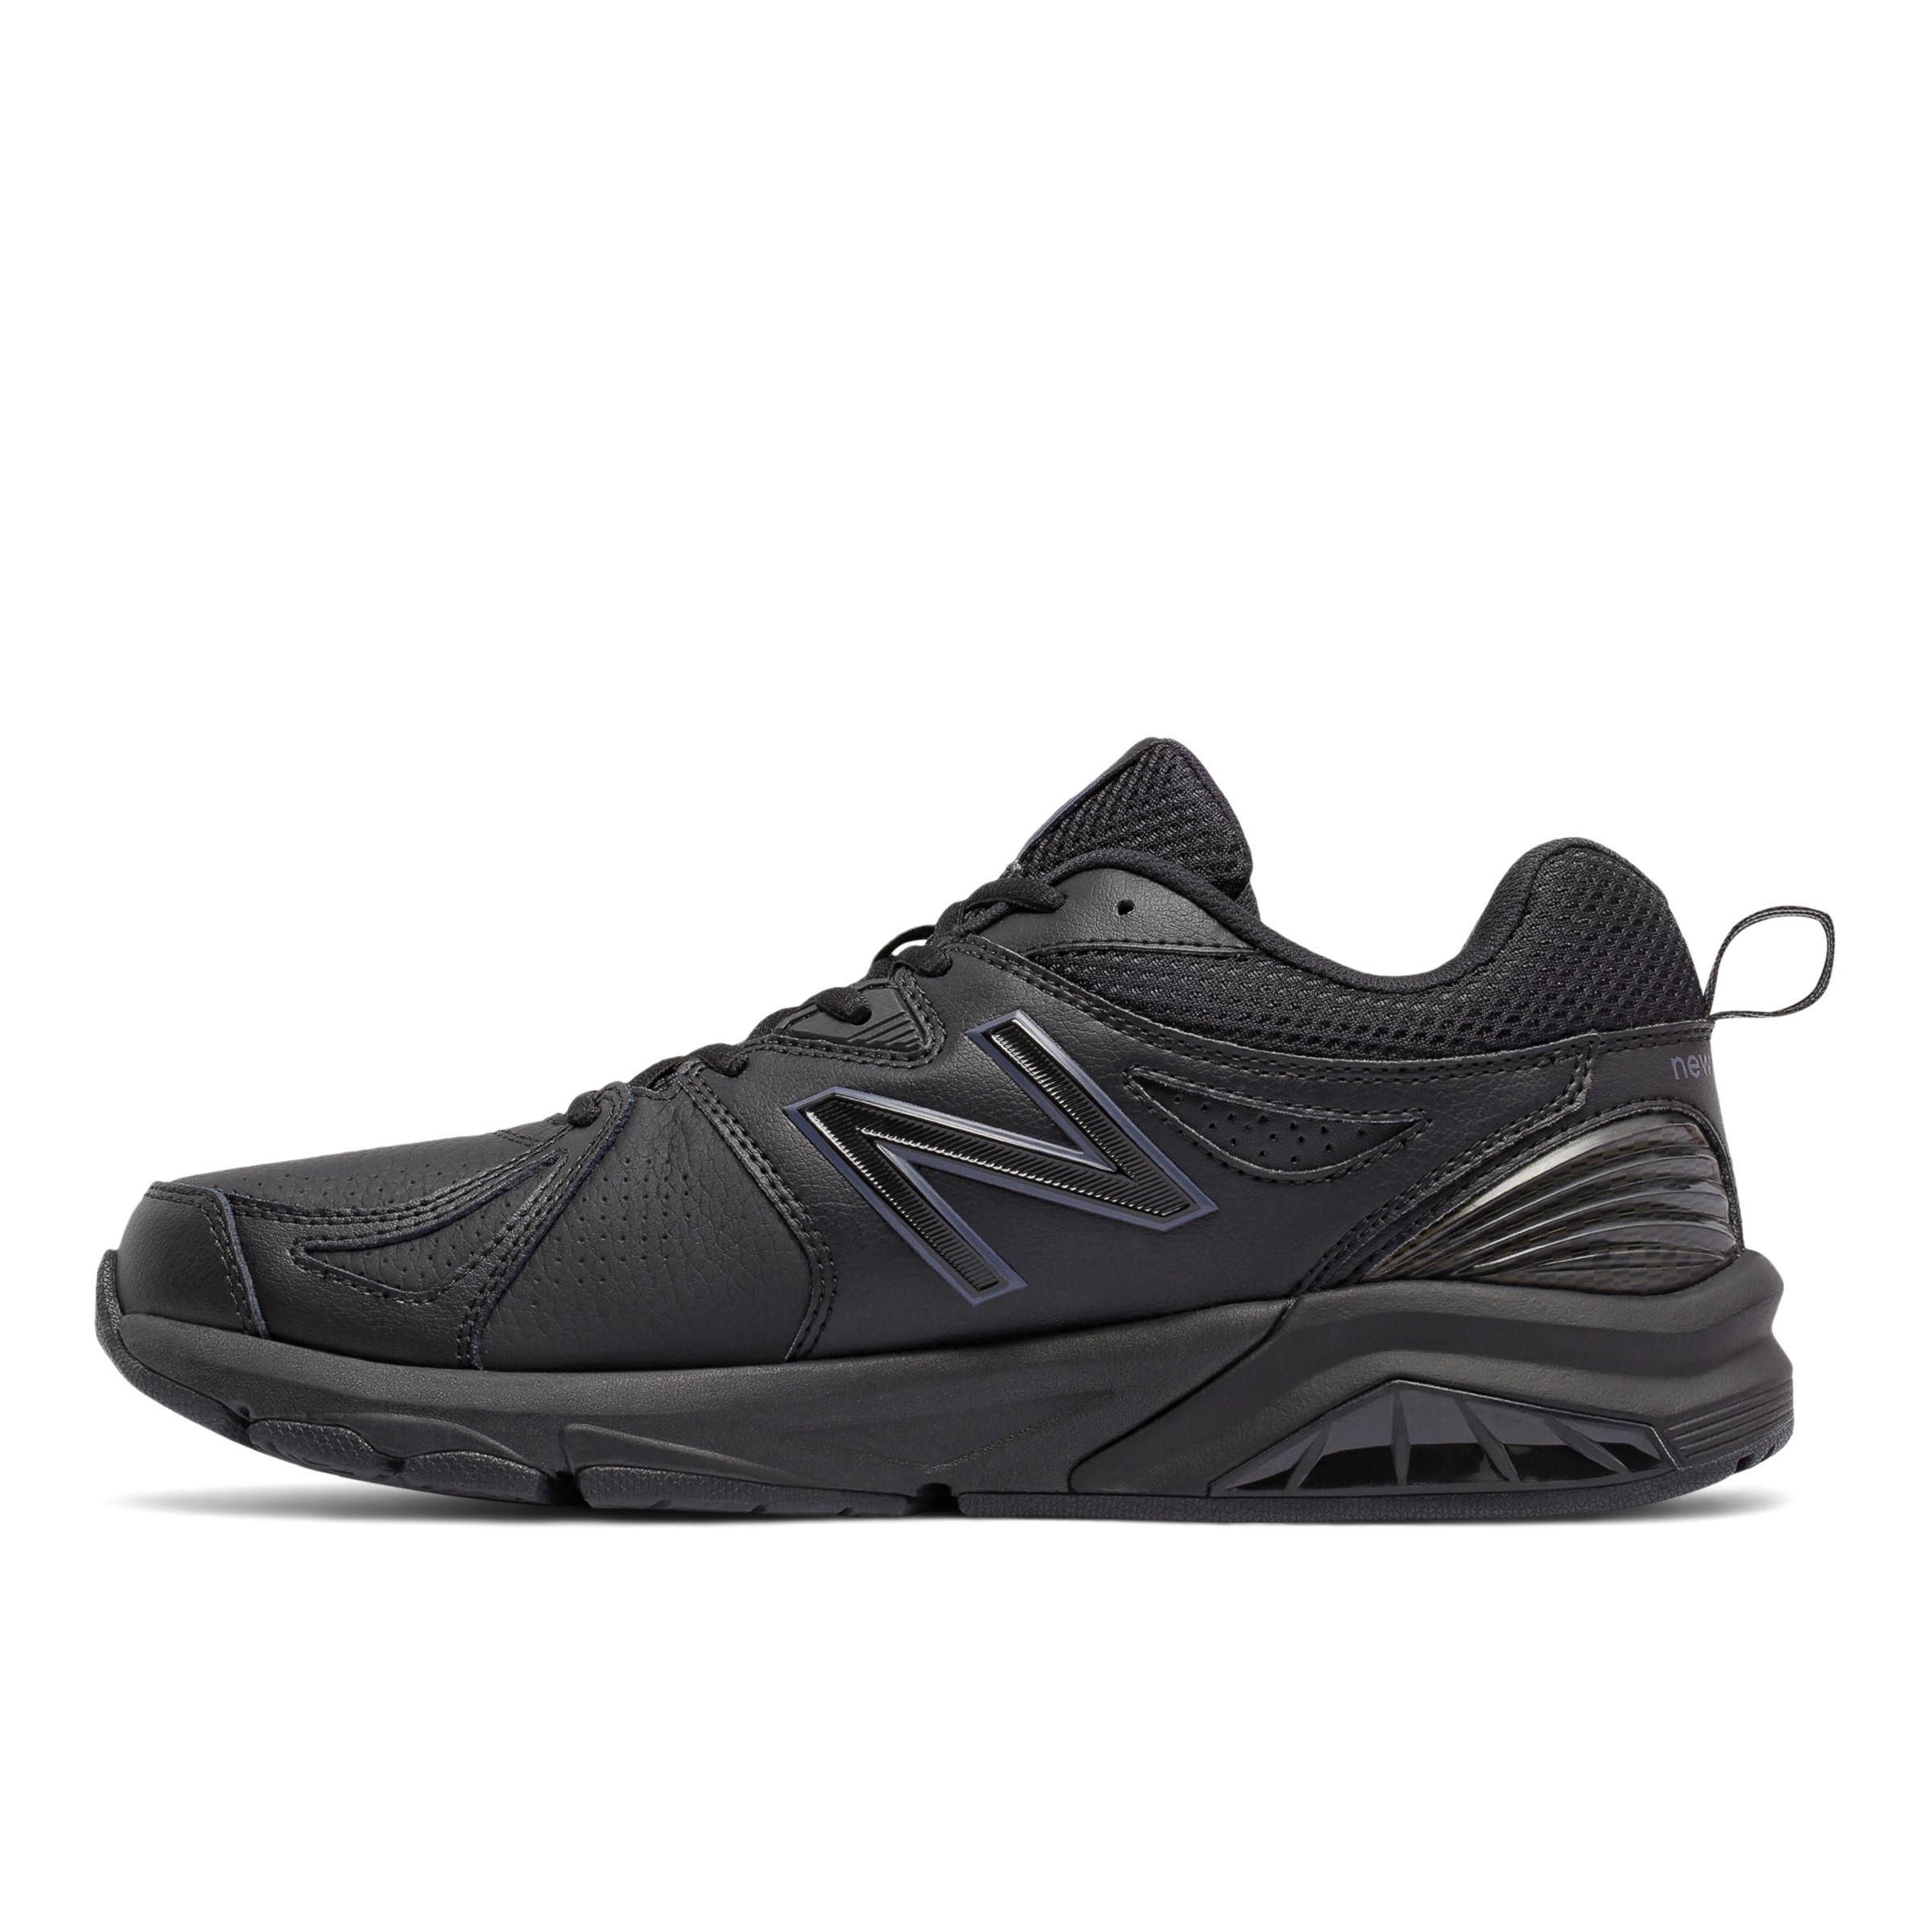 thumbnail 6 - New-Balance-857v2-Men-039-s-Running-Training-Shoes